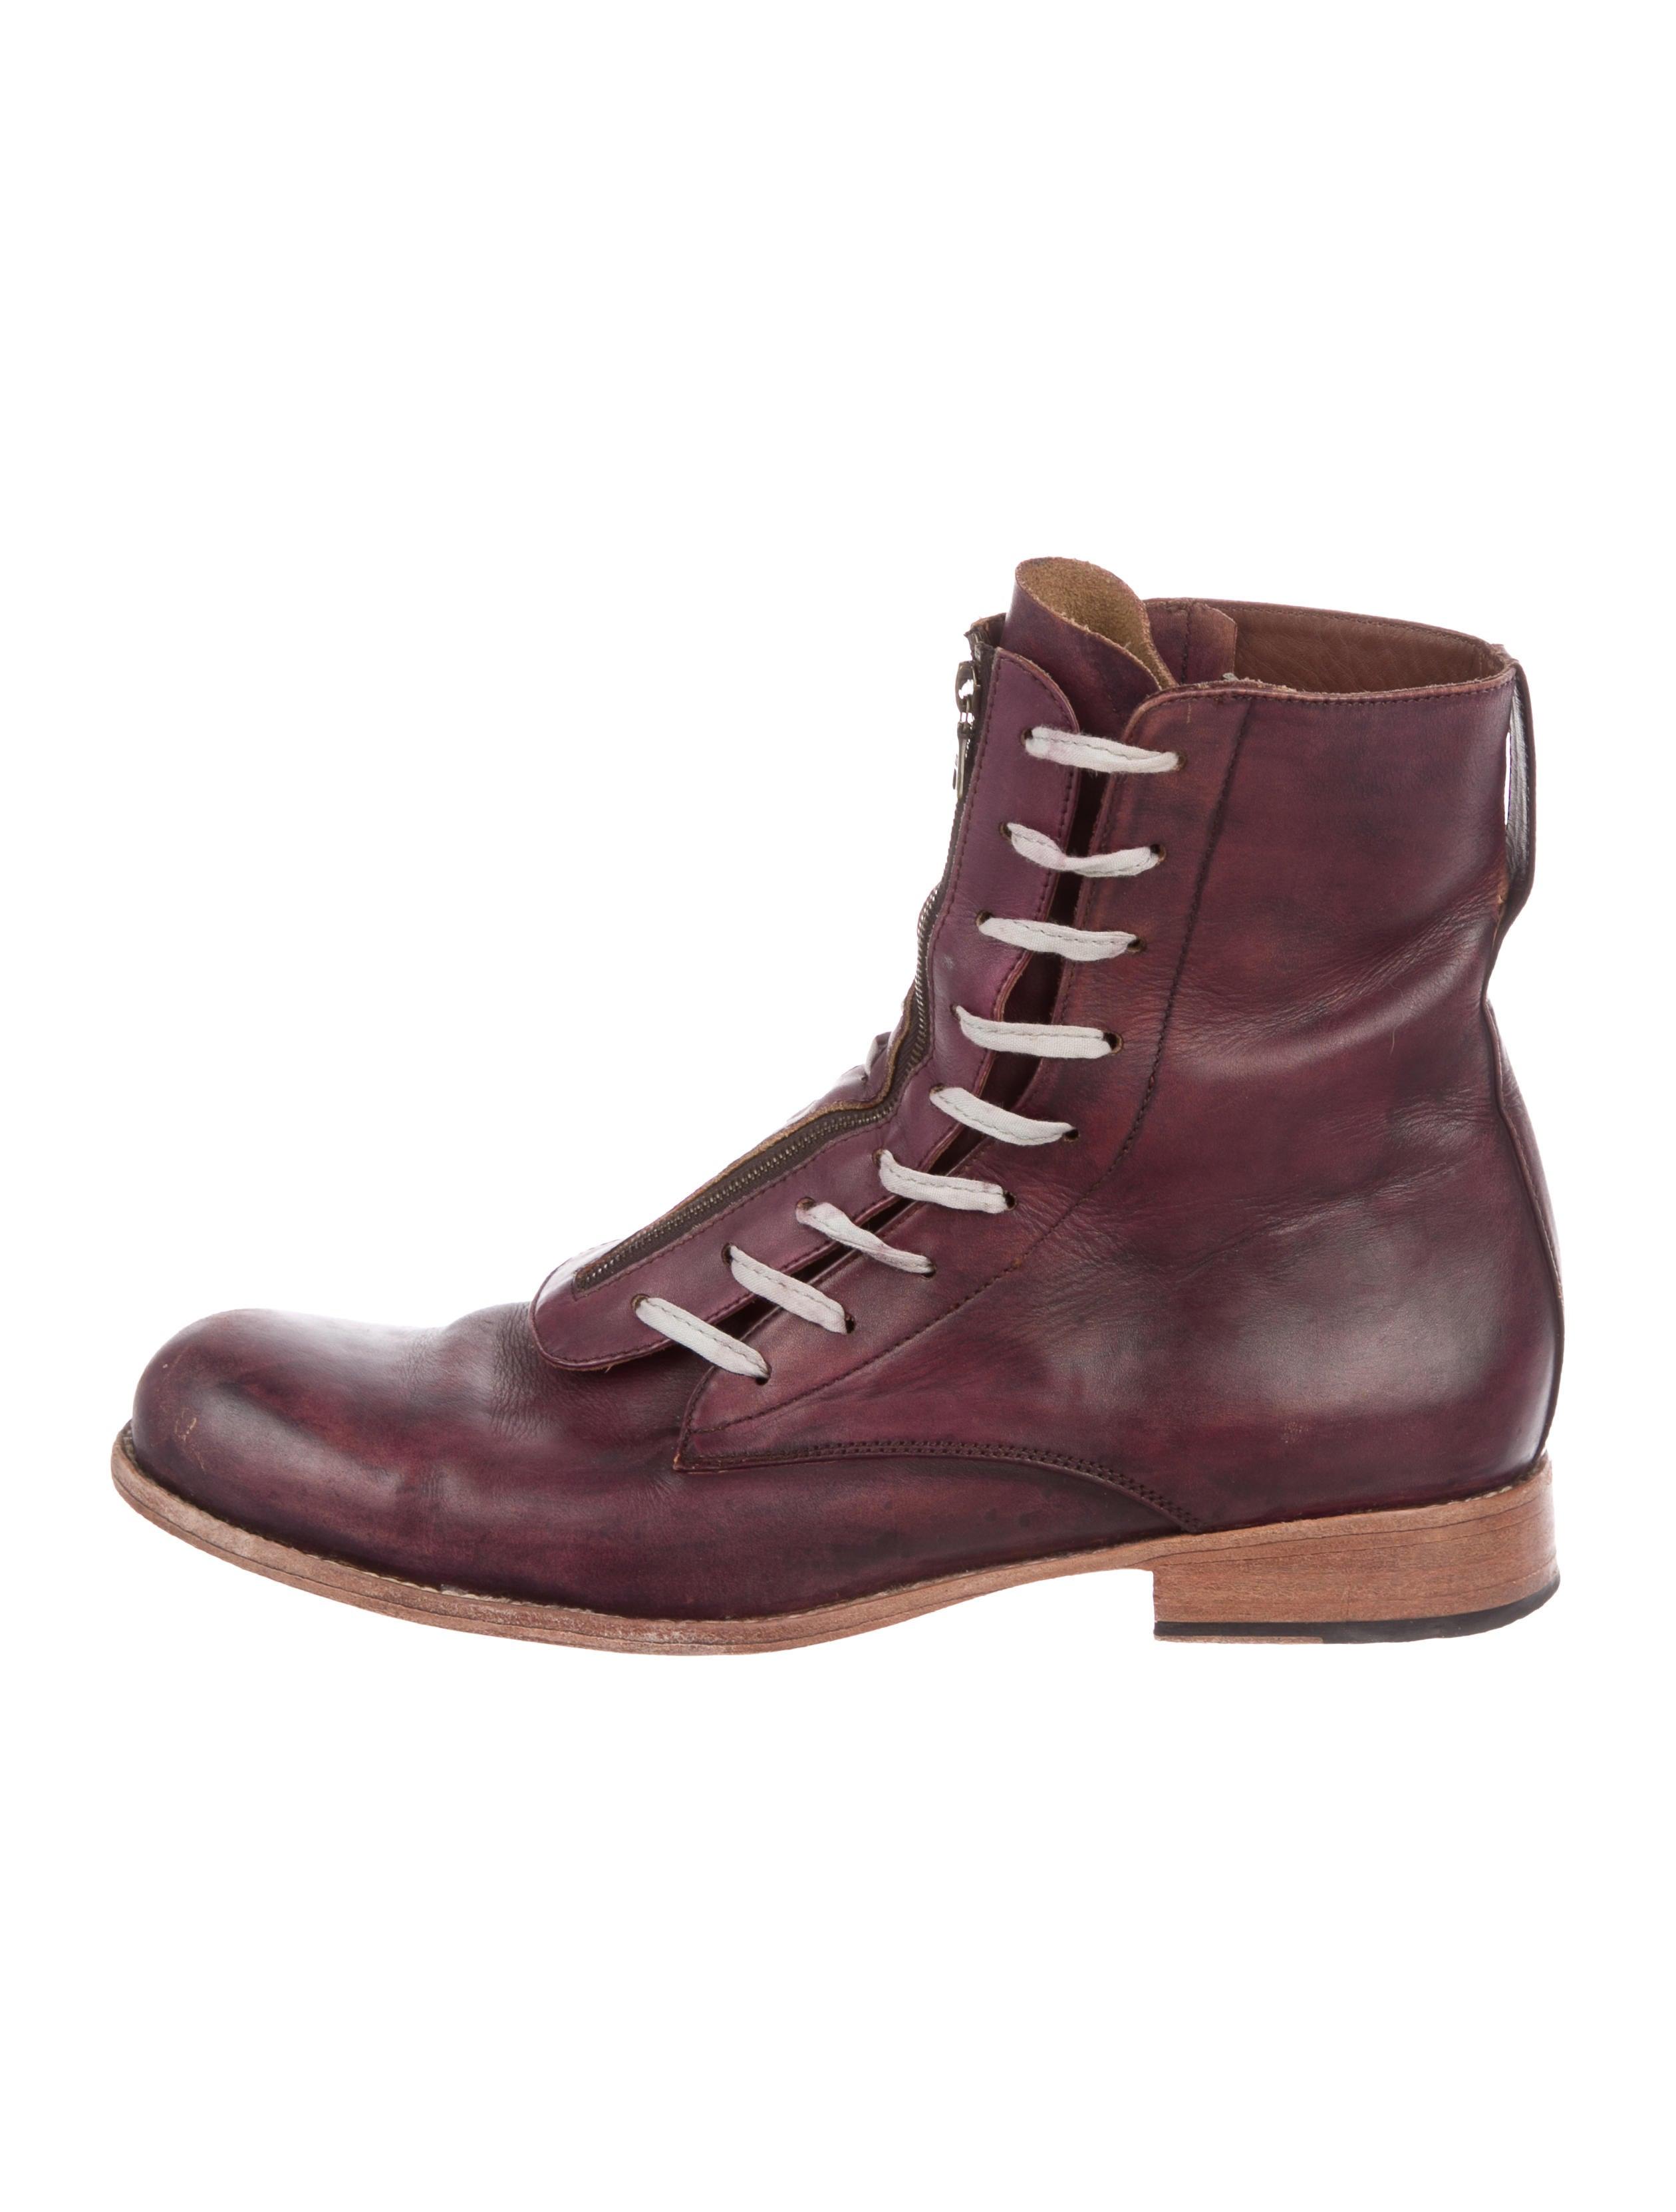 FOOTWEAR - Lace-up shoes Esquivel ucZ0y